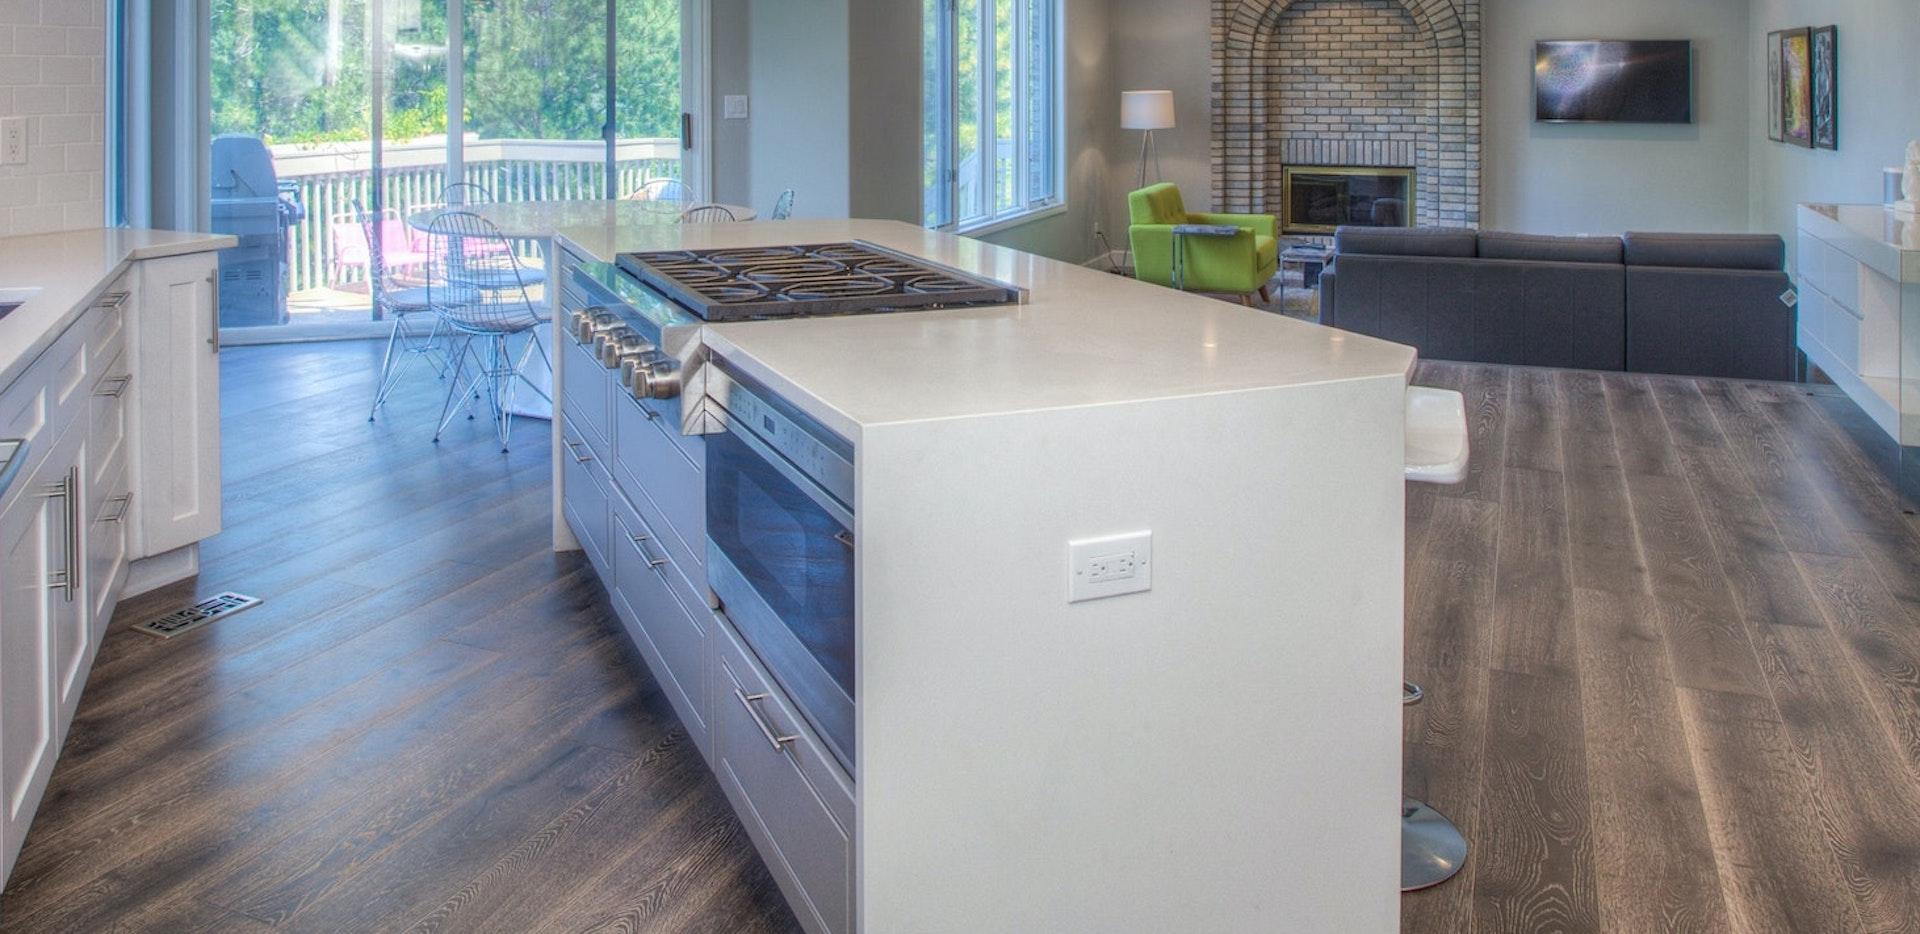 kitchen-fitter-1629194380Uz5Xs